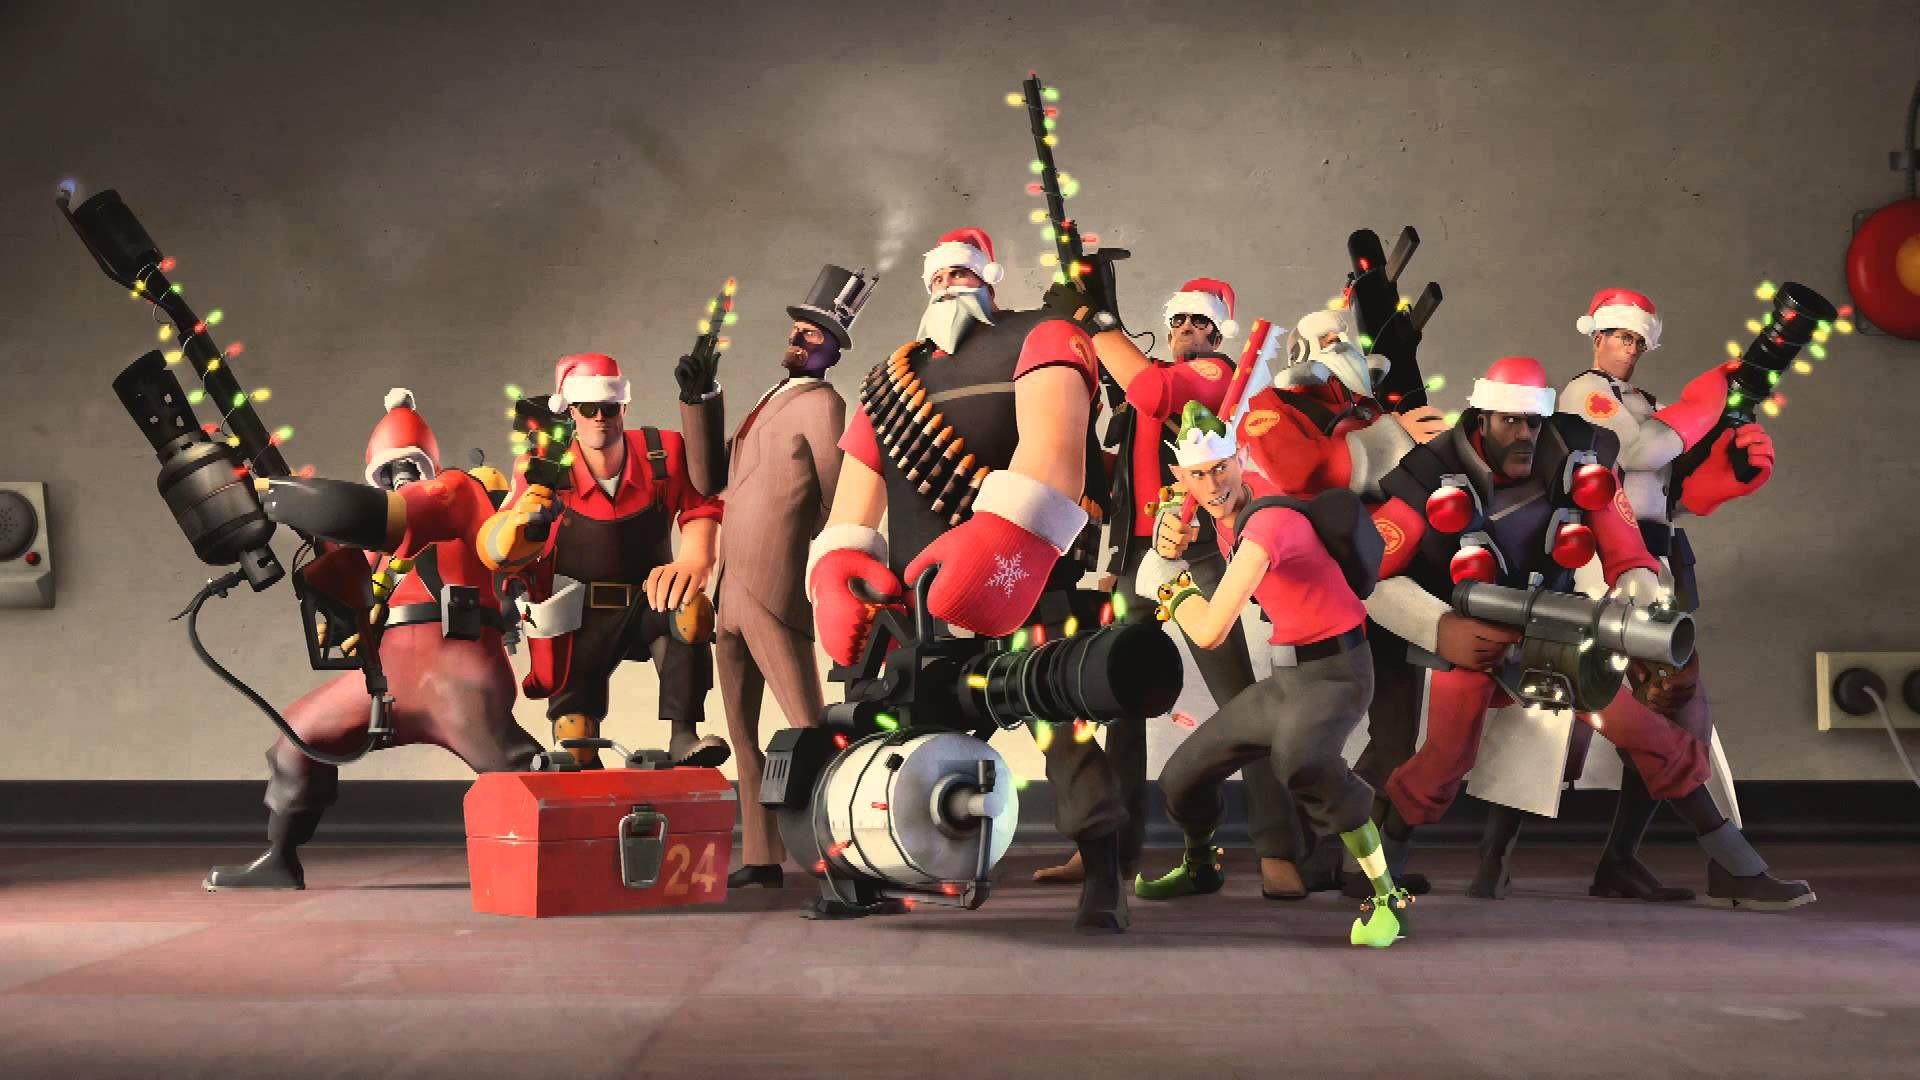 Rocket Jump Waltz Remix No Heavy Hd Team Fortress 2 Team Fortress Team Fortress 2 Game